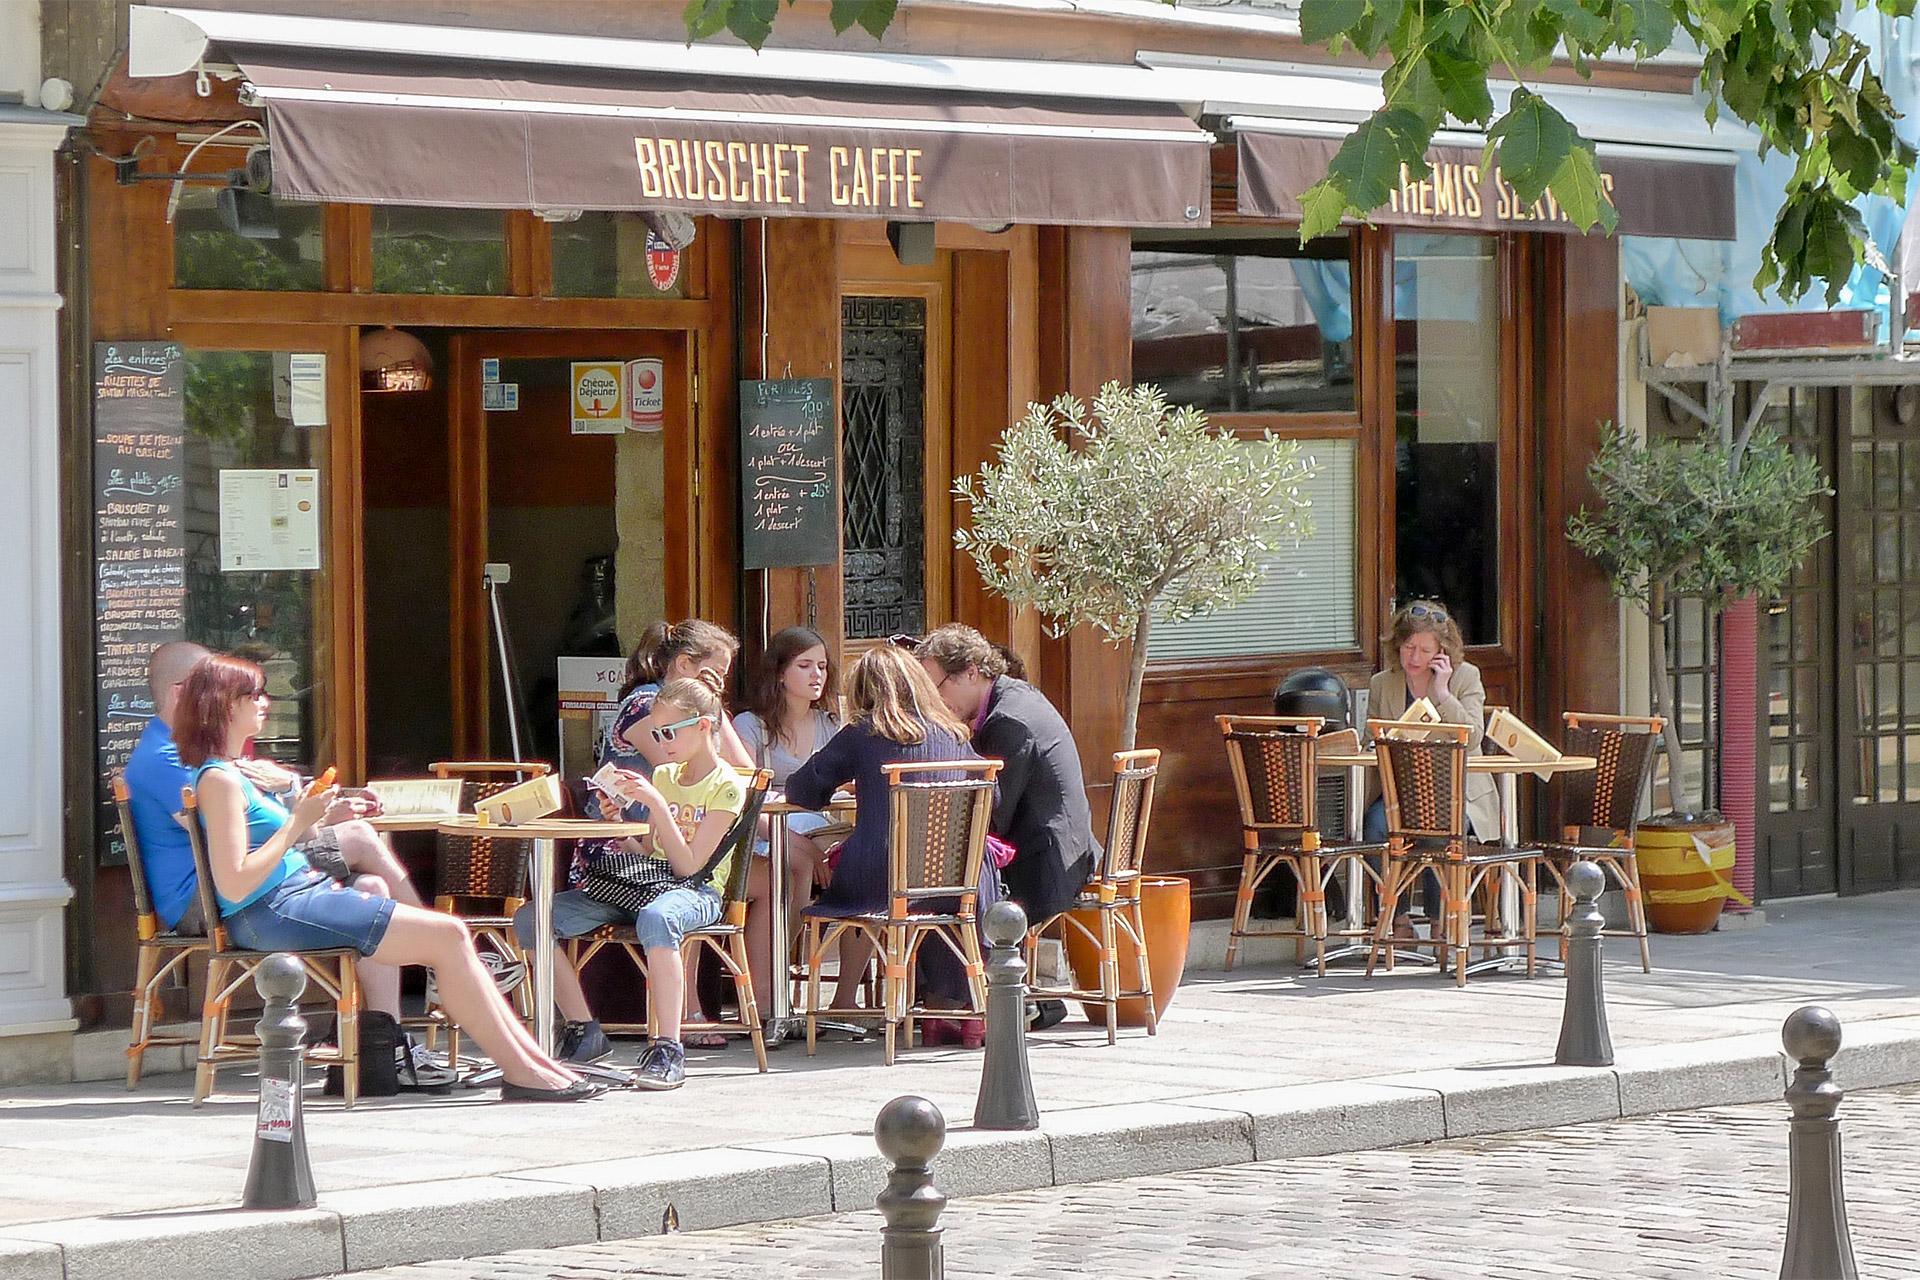 Bruschet Caffe on Place Dauphine